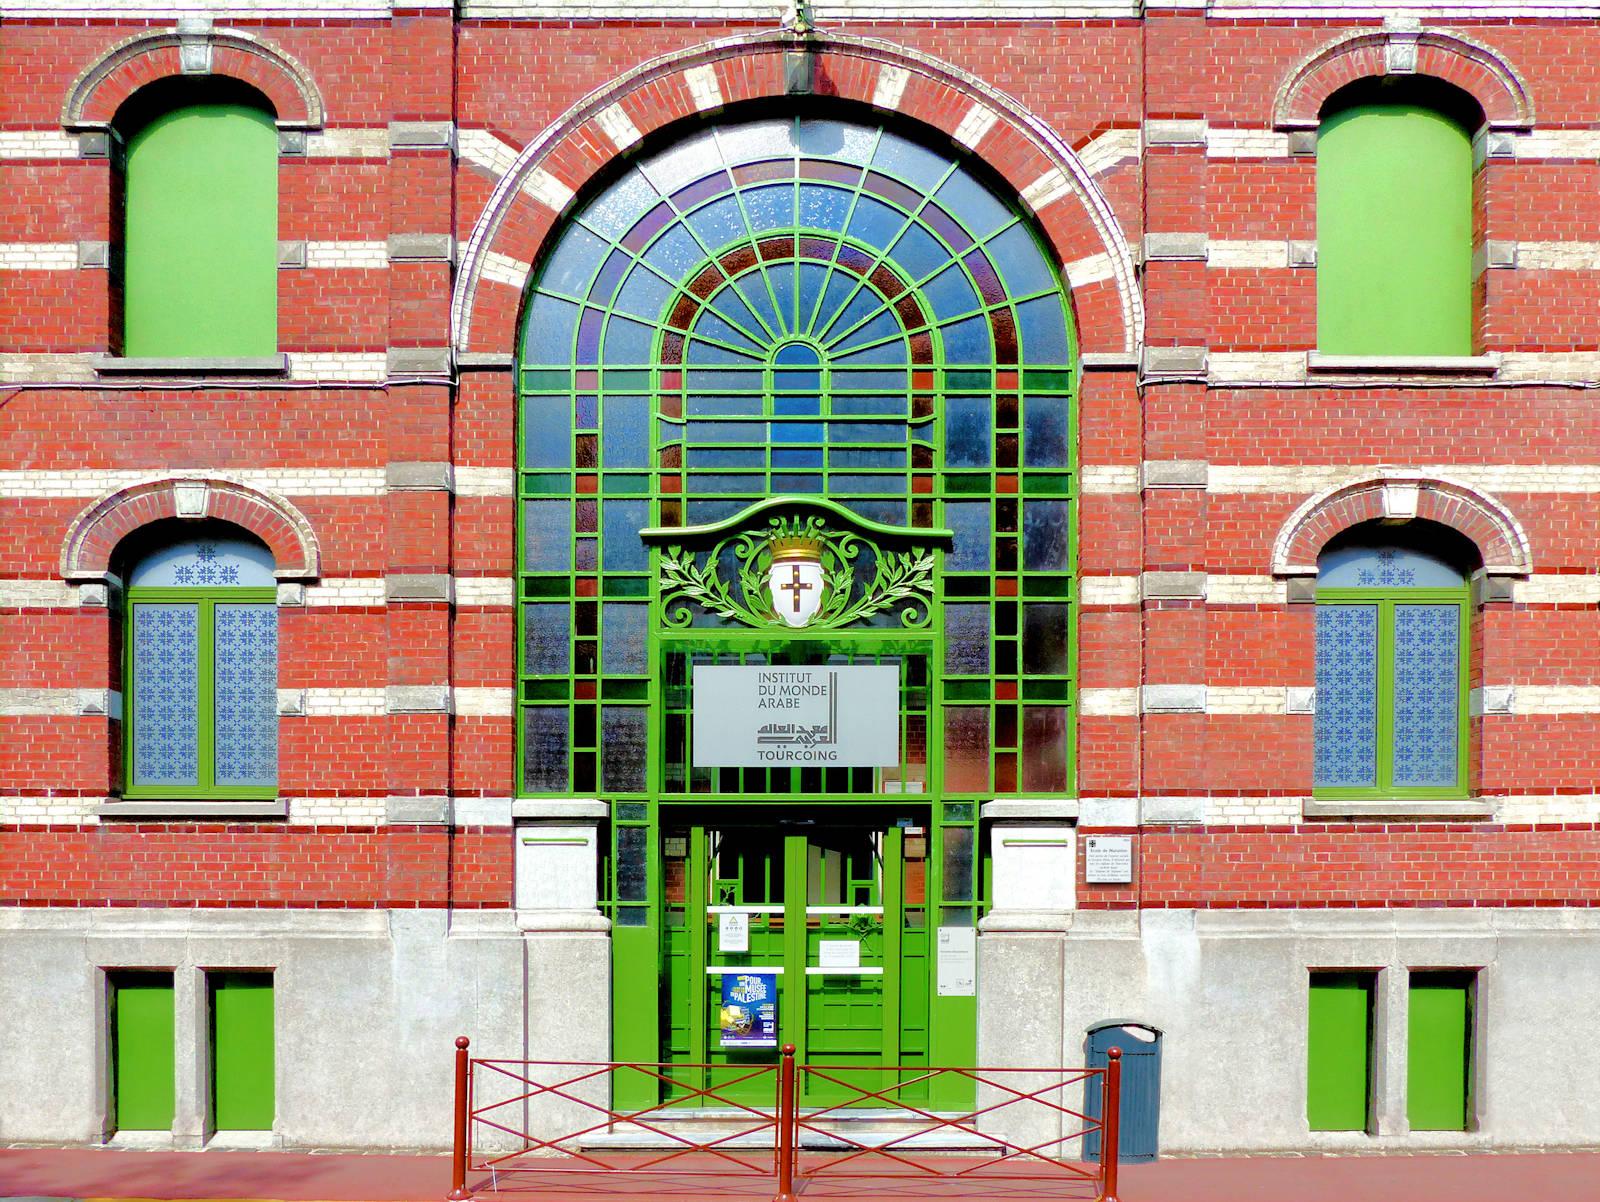 Institut du monde arabe - 9 rue Gabriel Péri, Tourcoing.